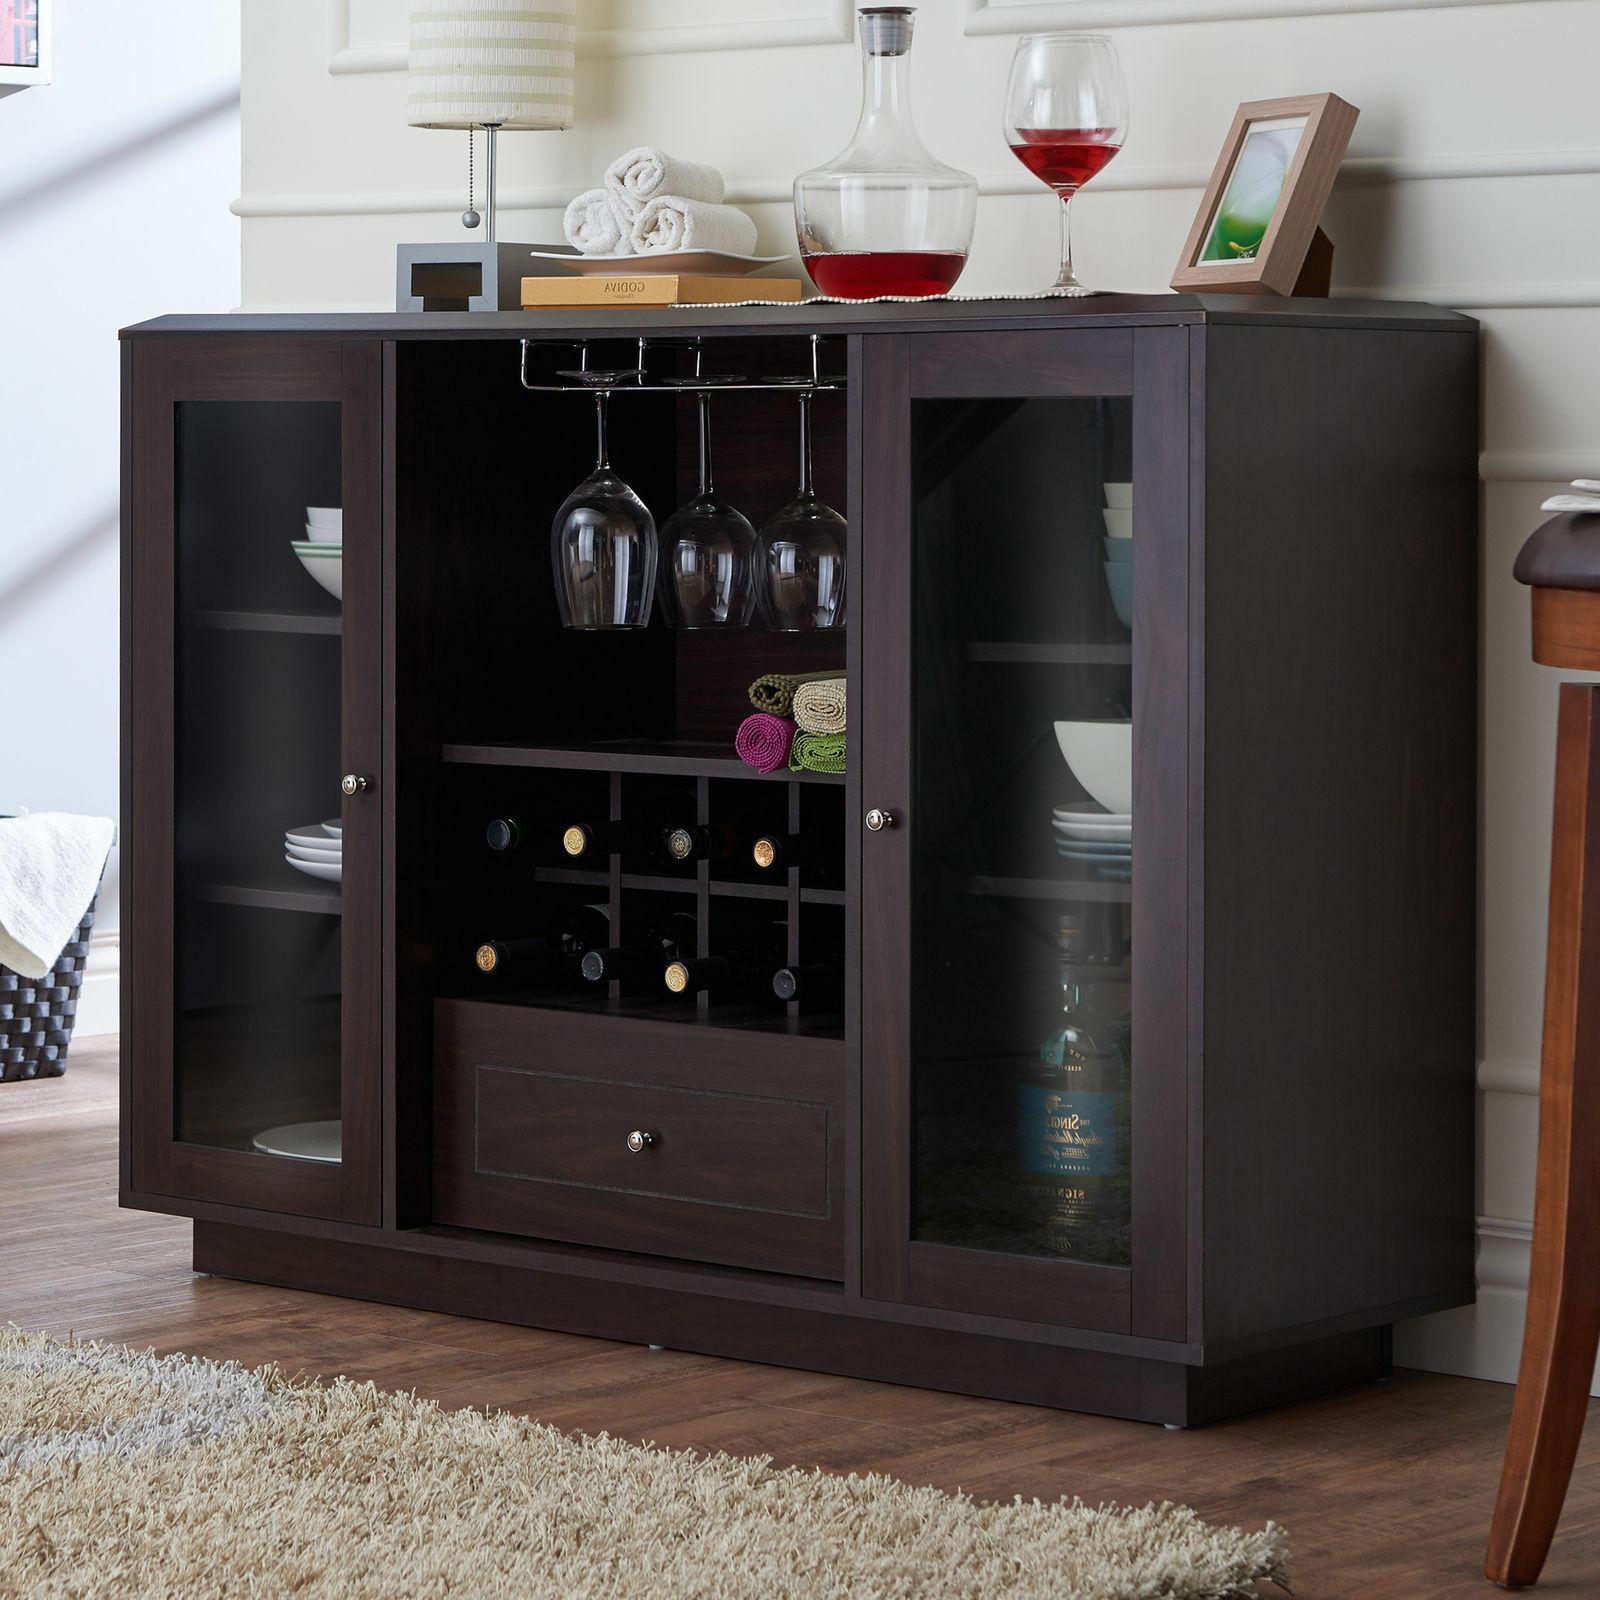 Modern Glass Doors Wine Rack Storage Buffet Dining Room Cabinet  Espresso  Finish Regarding Modern Espresso Storage Buffets (View 17 of 20)